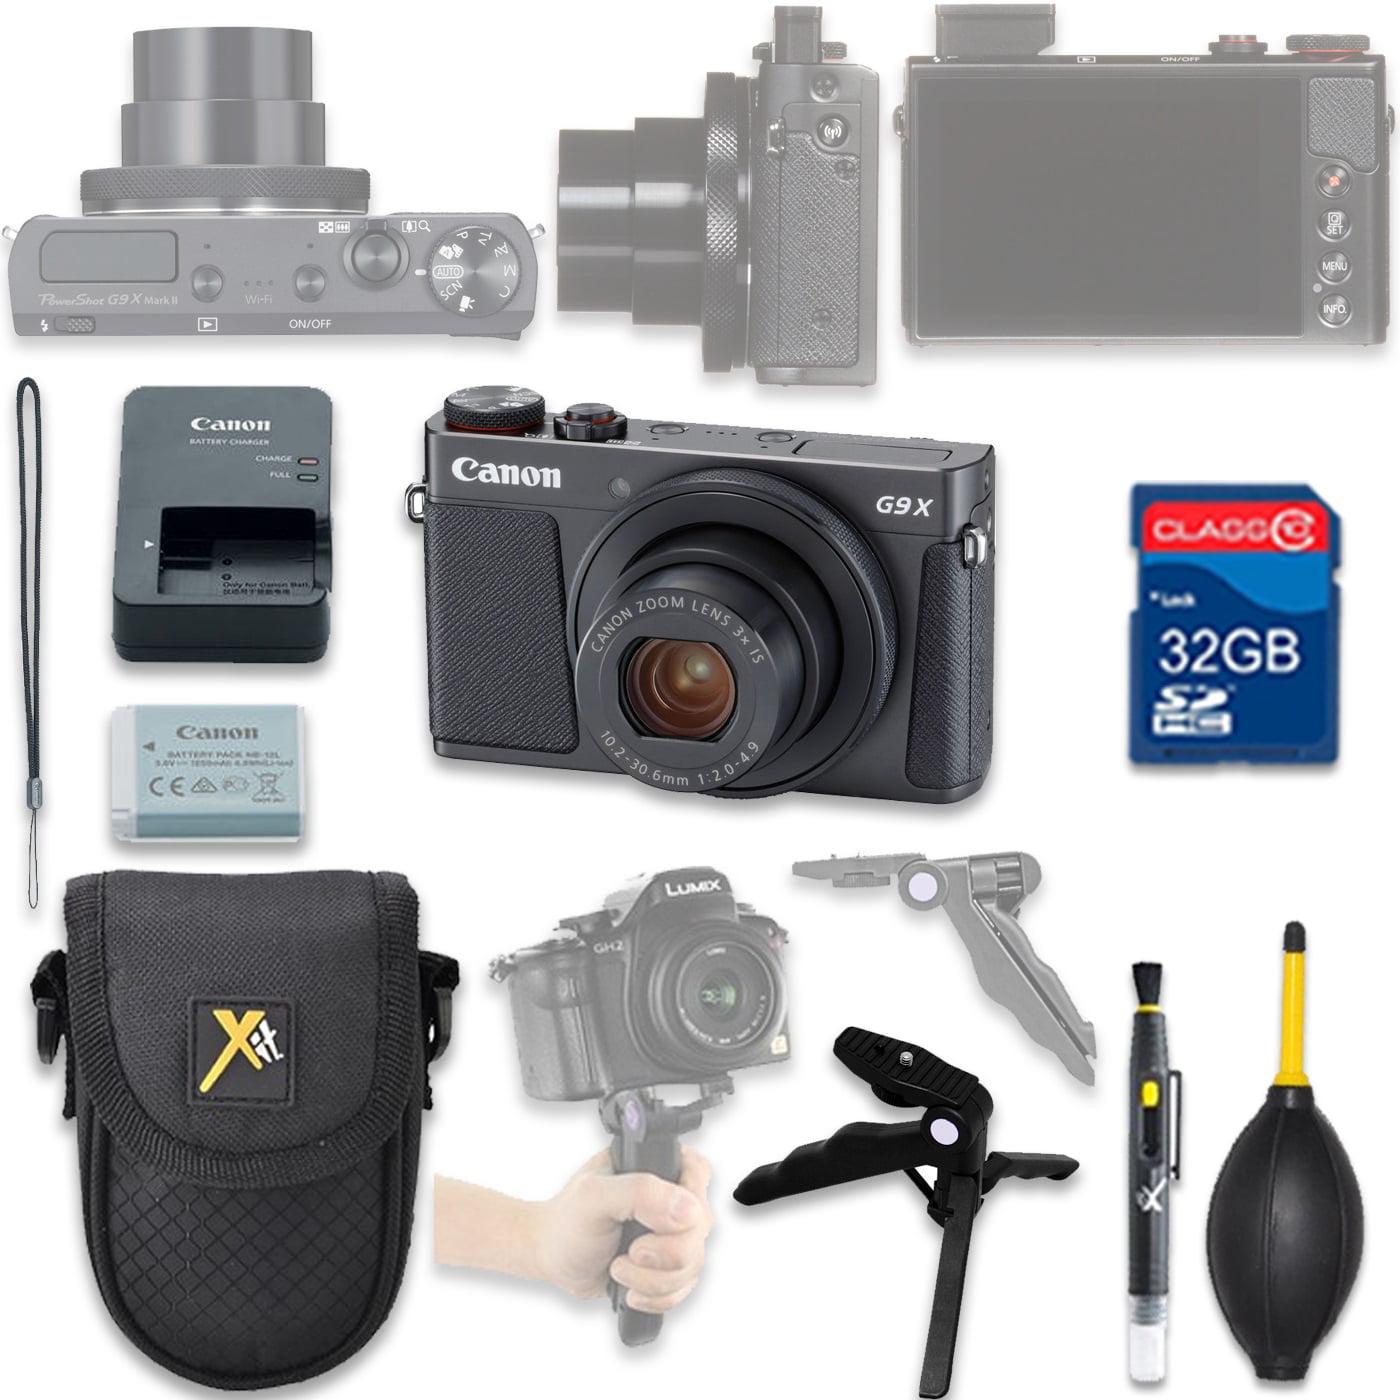 Canon PowerShot G9 X Mark II Digital Camera(Black) with 32GB SD Memory Card + Accessory Bundle